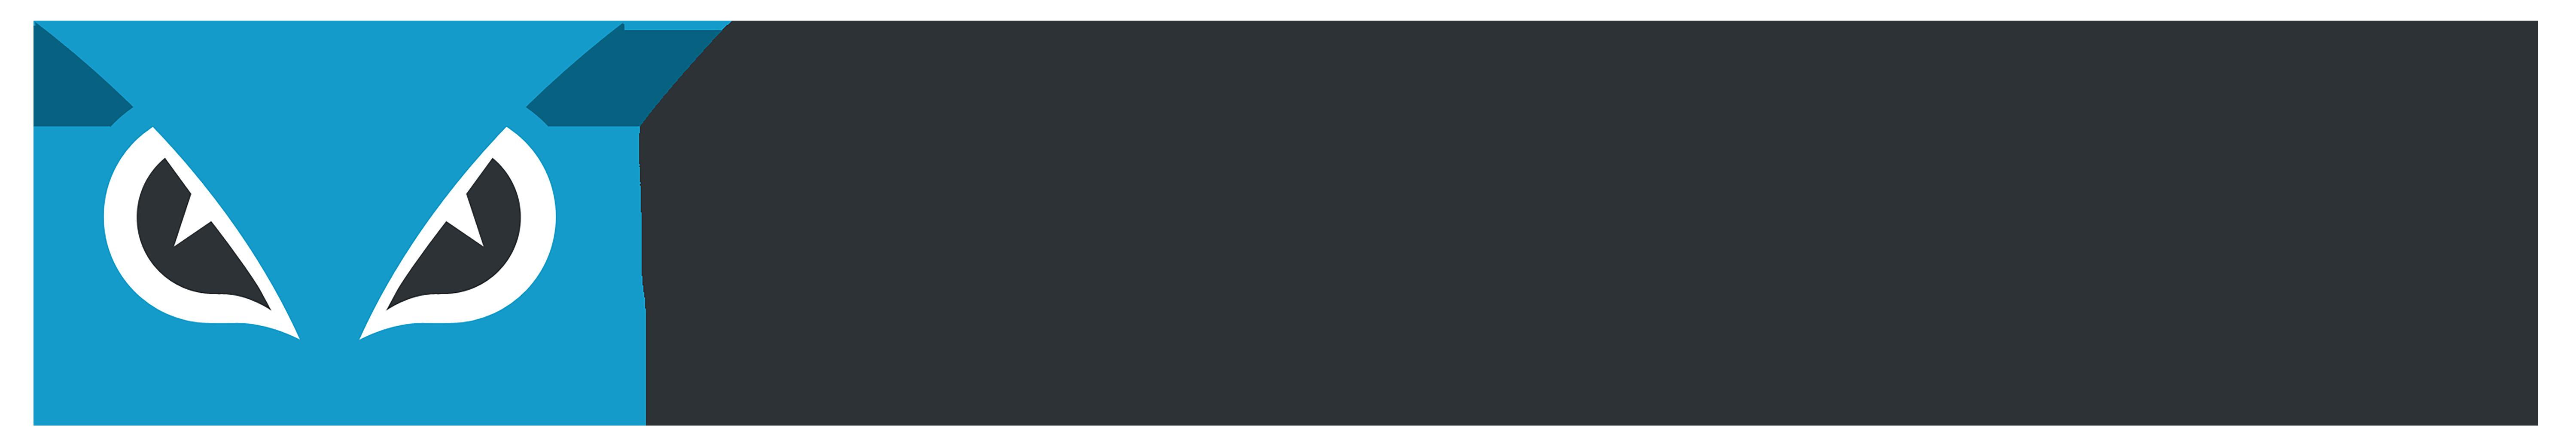 cyberreason_logo.png